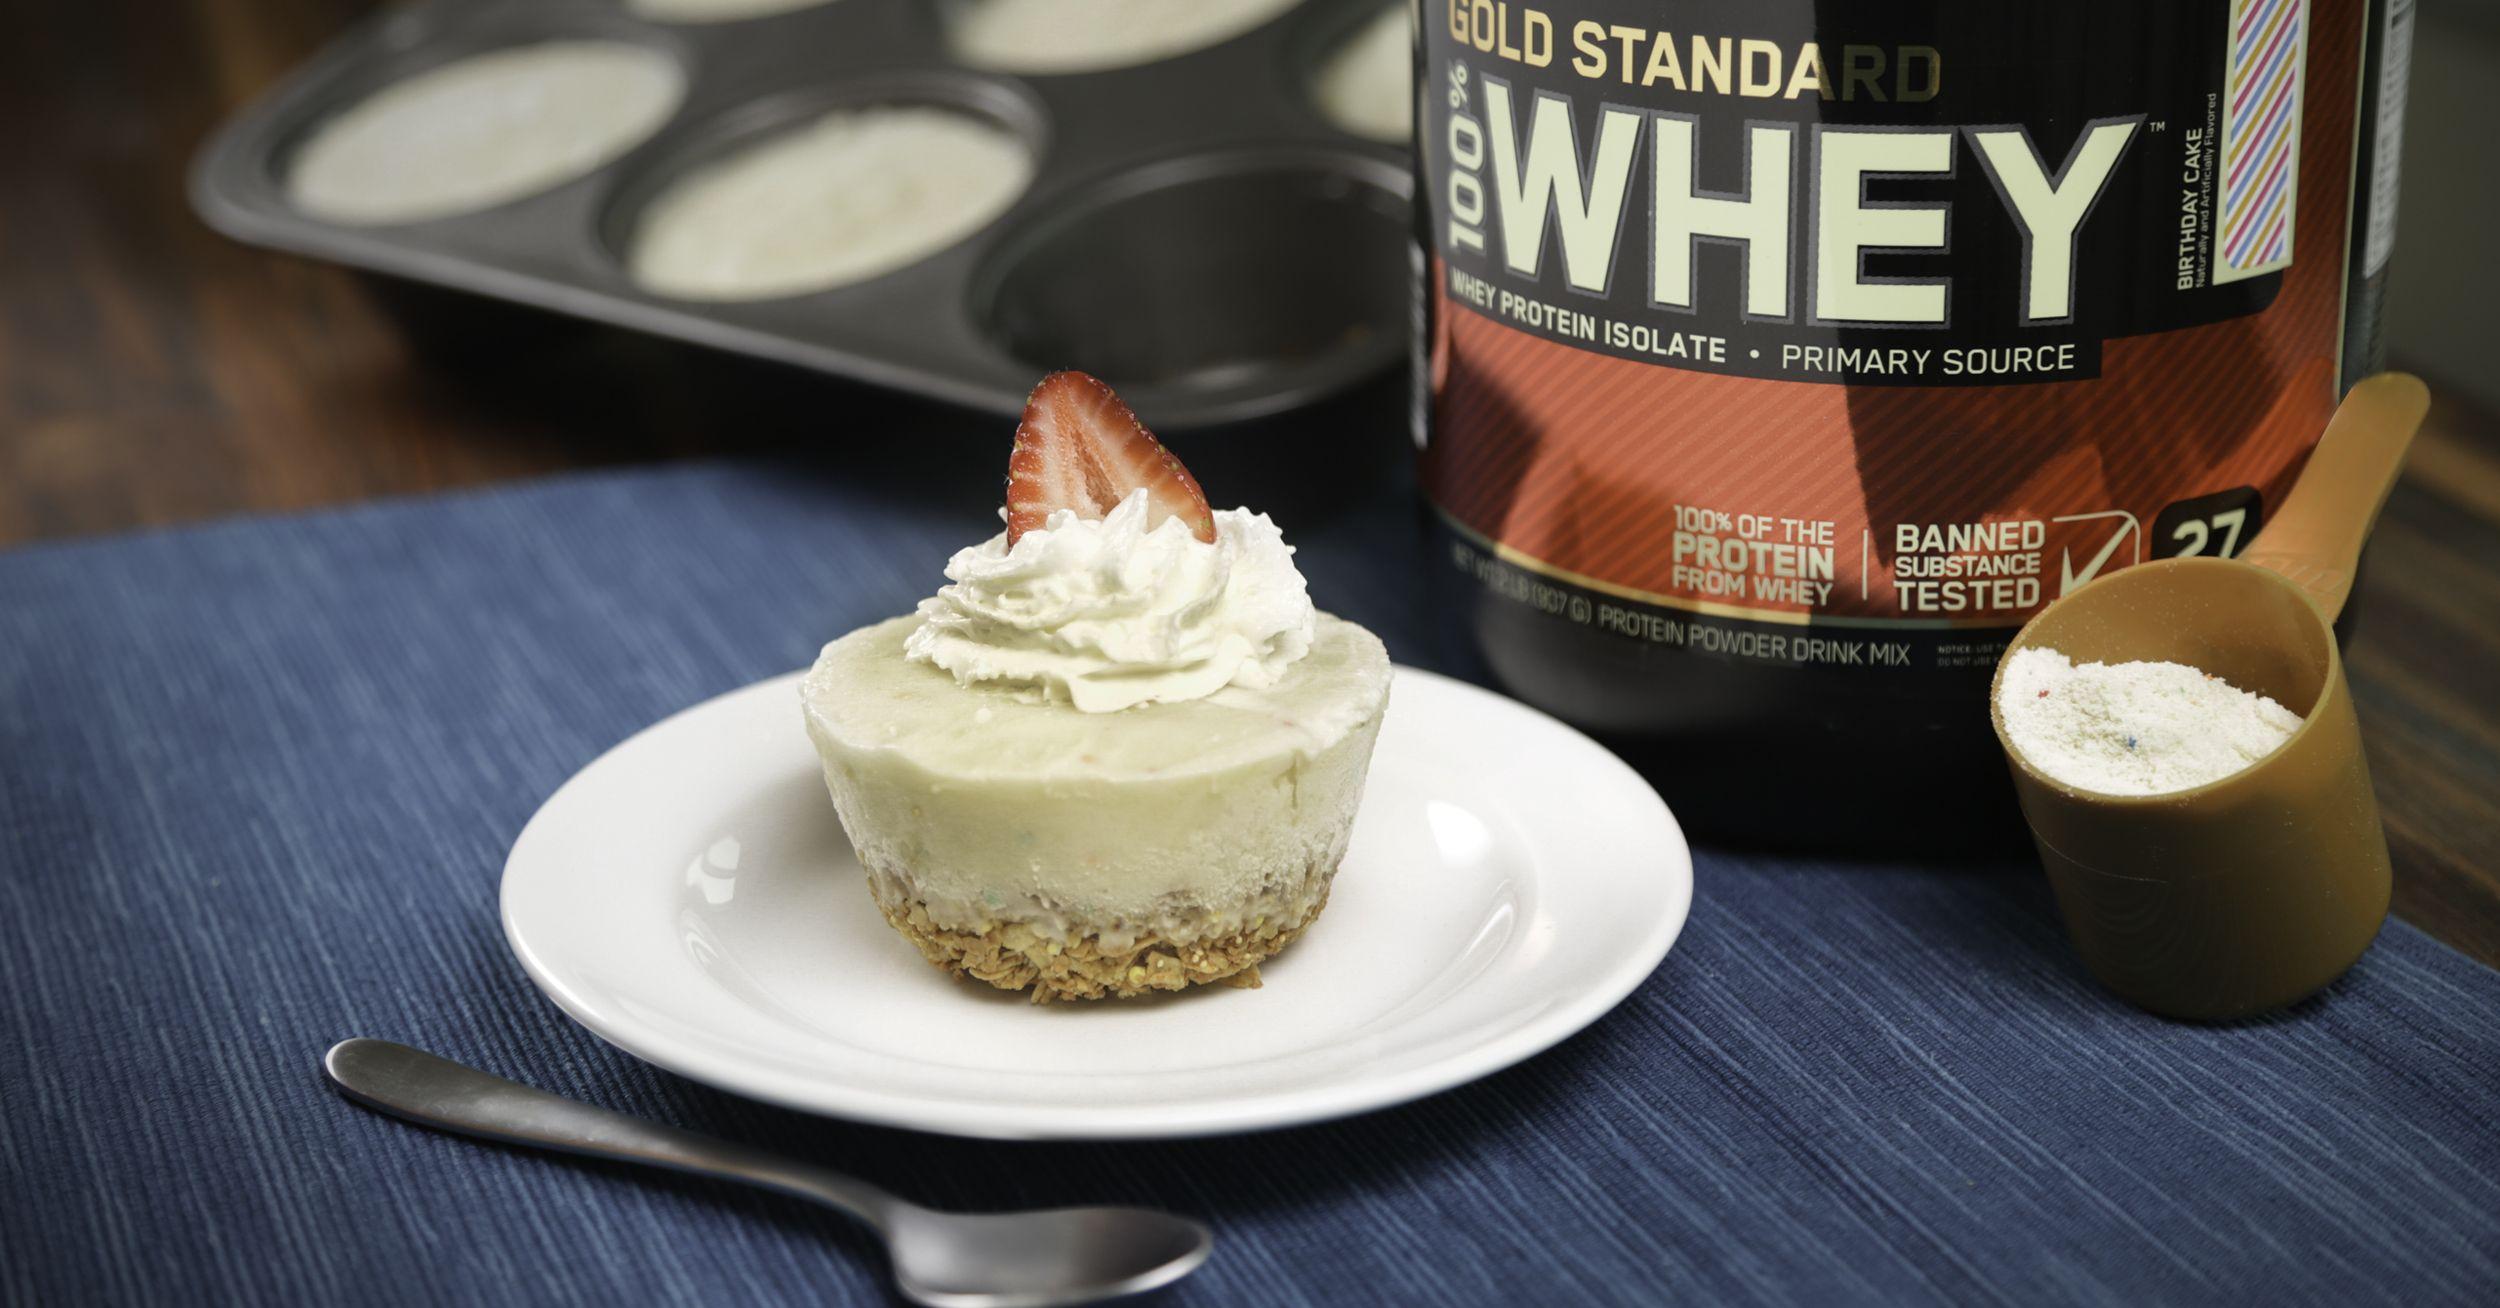 Optimum Nutrition Protein Recipes Whey Protein Recipes Shakes Yogurt Bites Protein Shake Recipes